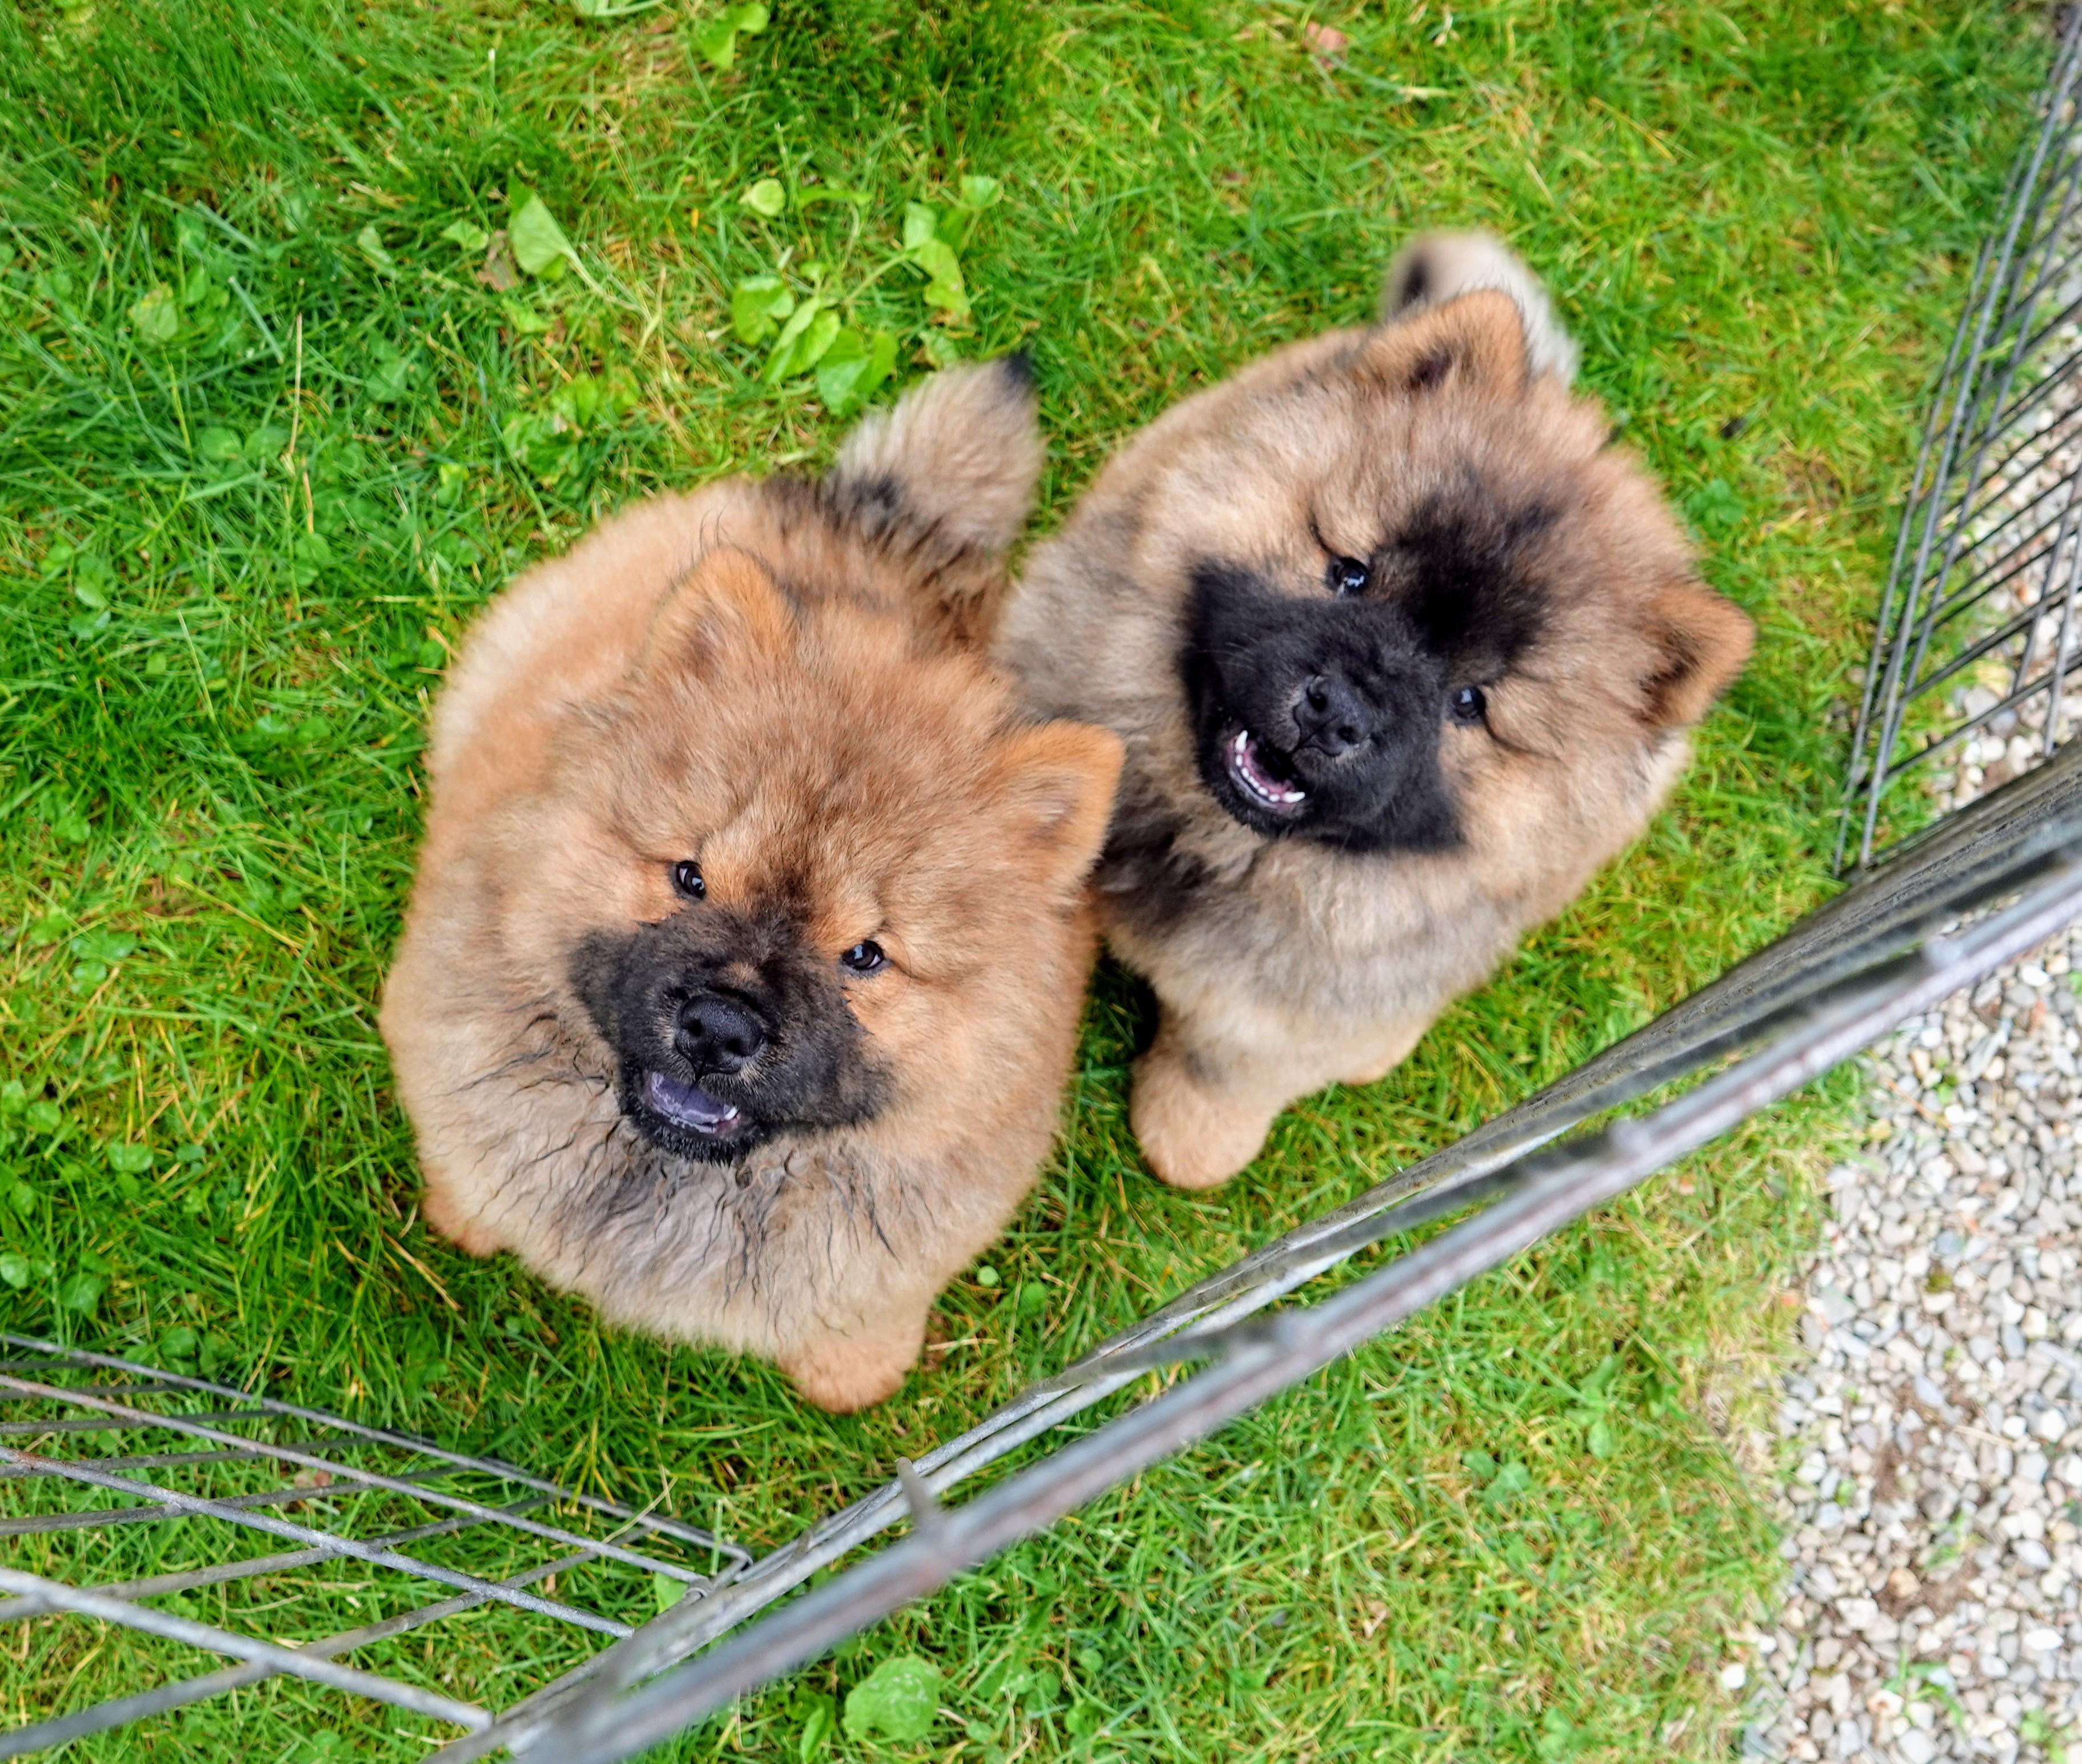 The Martha Stewart Blog Blog Archive A Chow Chow Puppy At The Farm